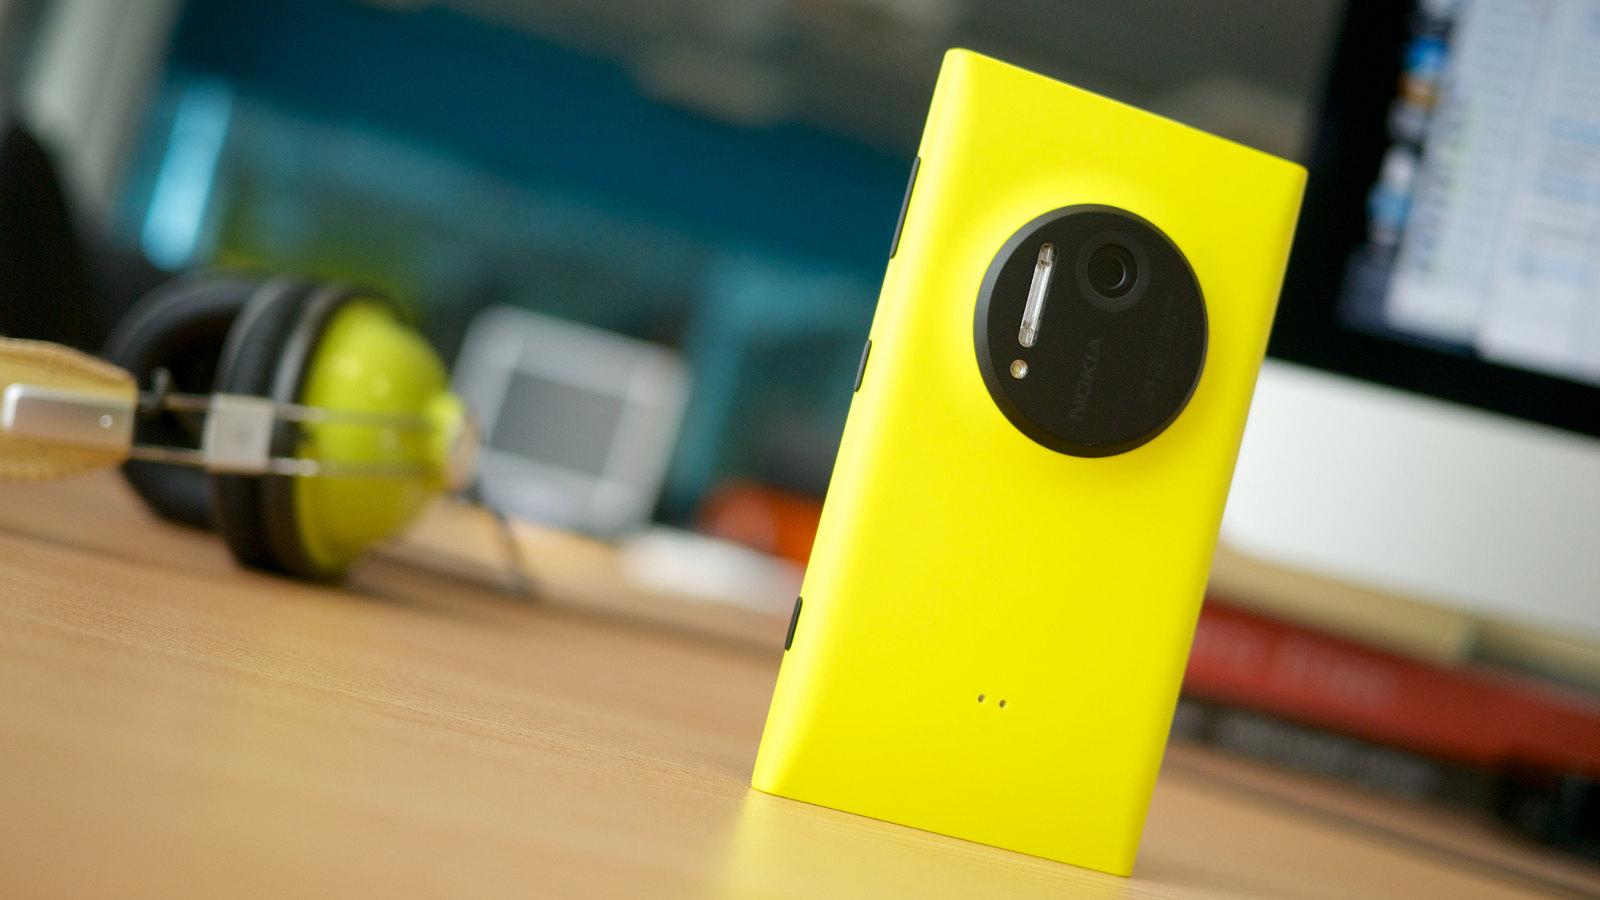 lumia 1020 karlis dambrans flickr